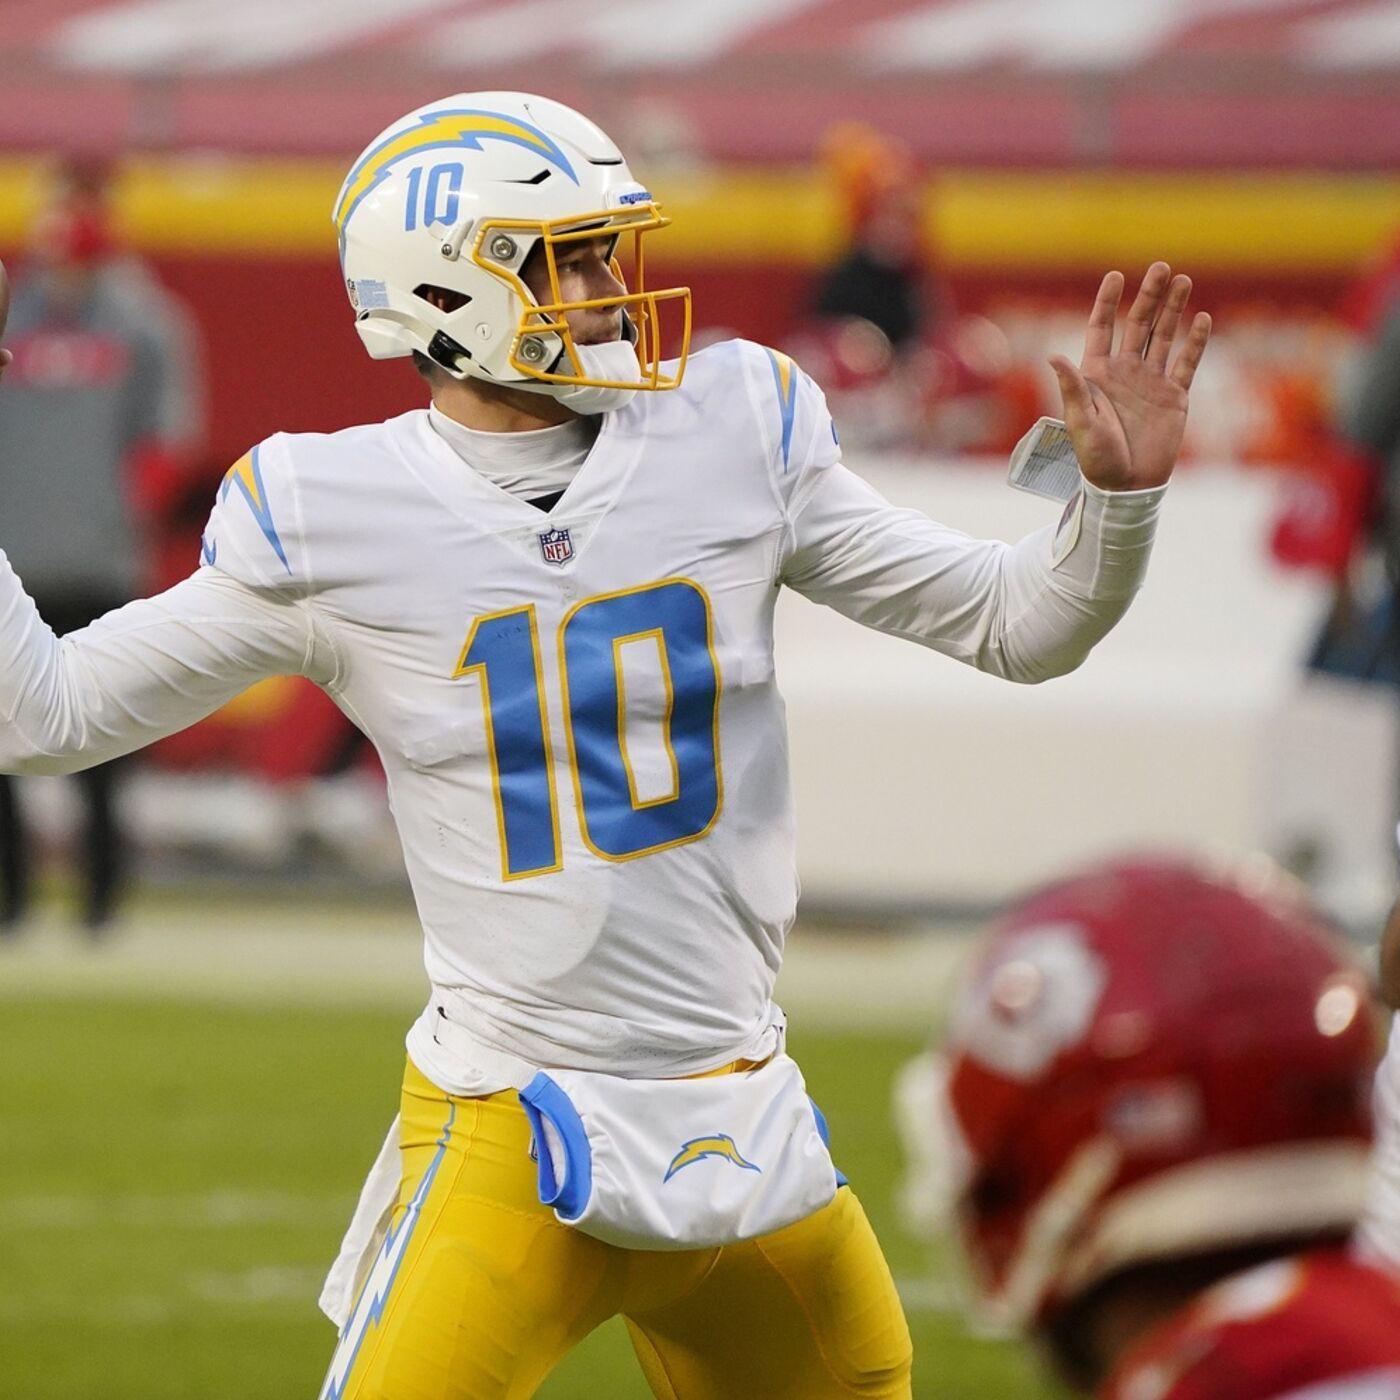 Episode 2: NFL Week 1, CFB Week 2 Best Bets